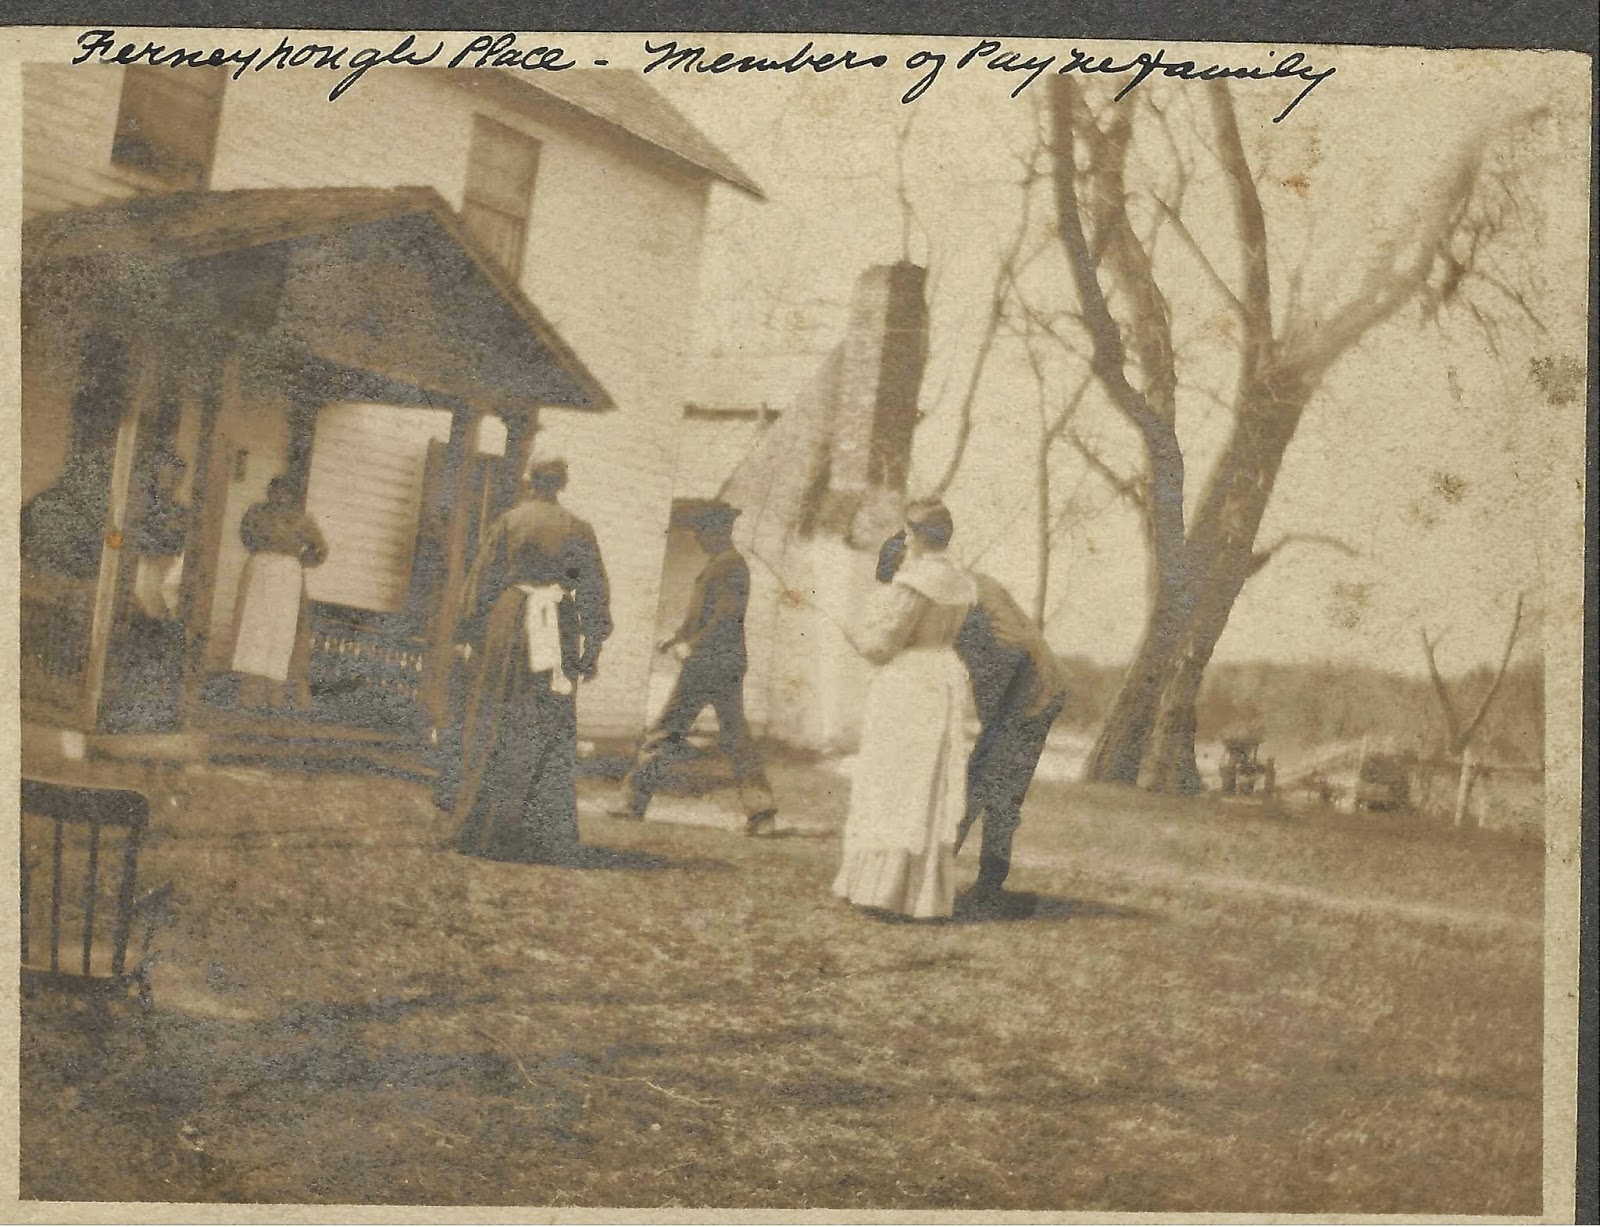 Ferneyhough place in Spotsy - Robert Walker